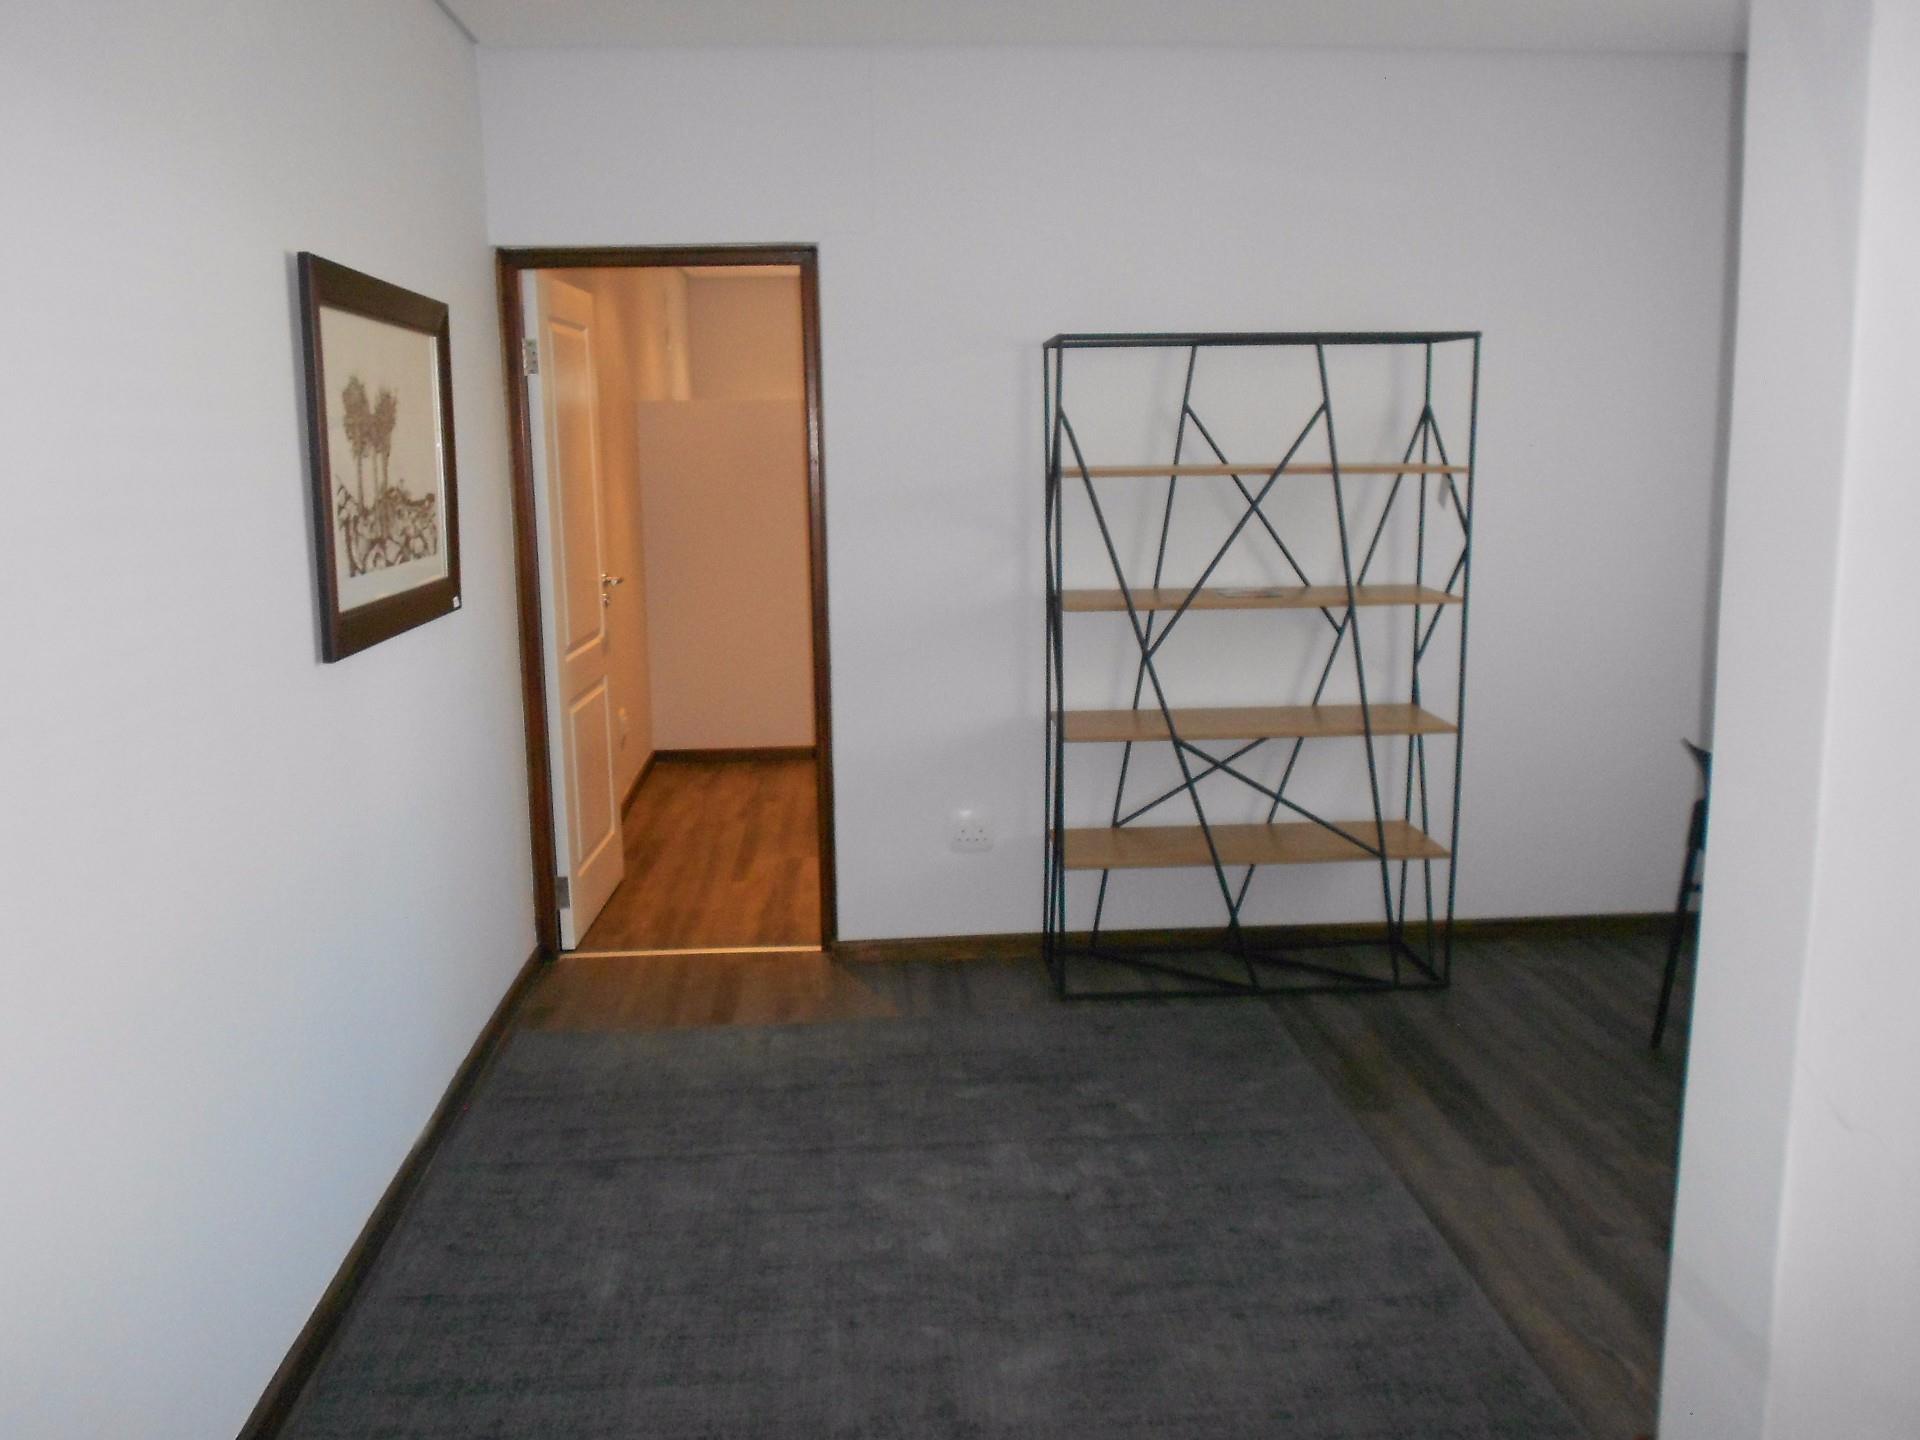 3 Bedroom Duplex For Sale in Kleine Kuppe